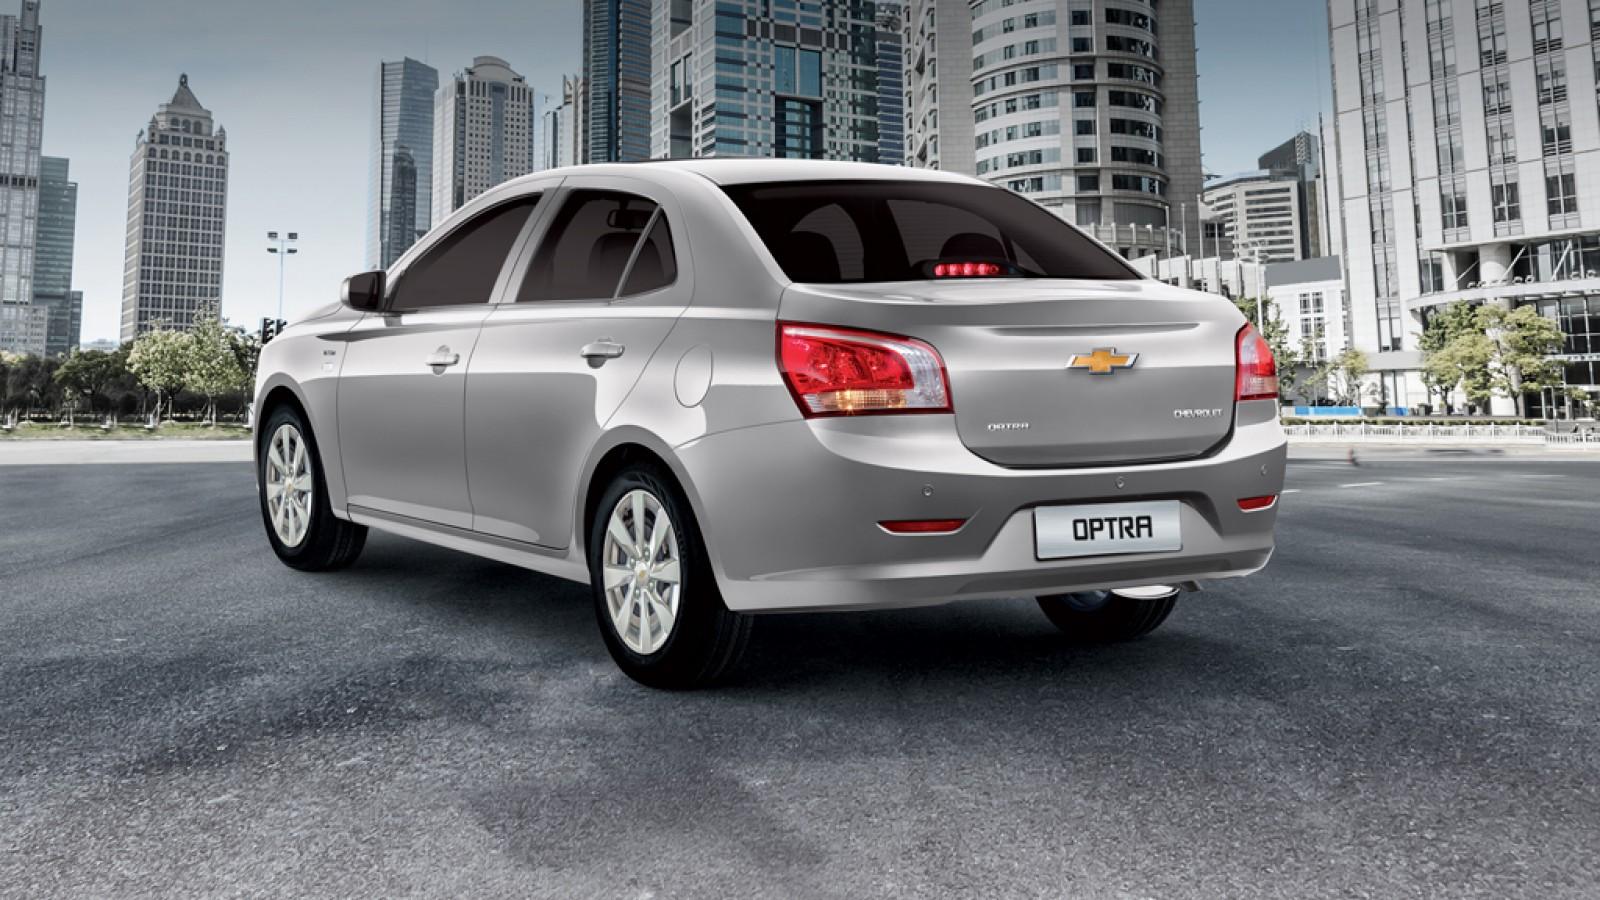 Chevrolet Optra New Car Price